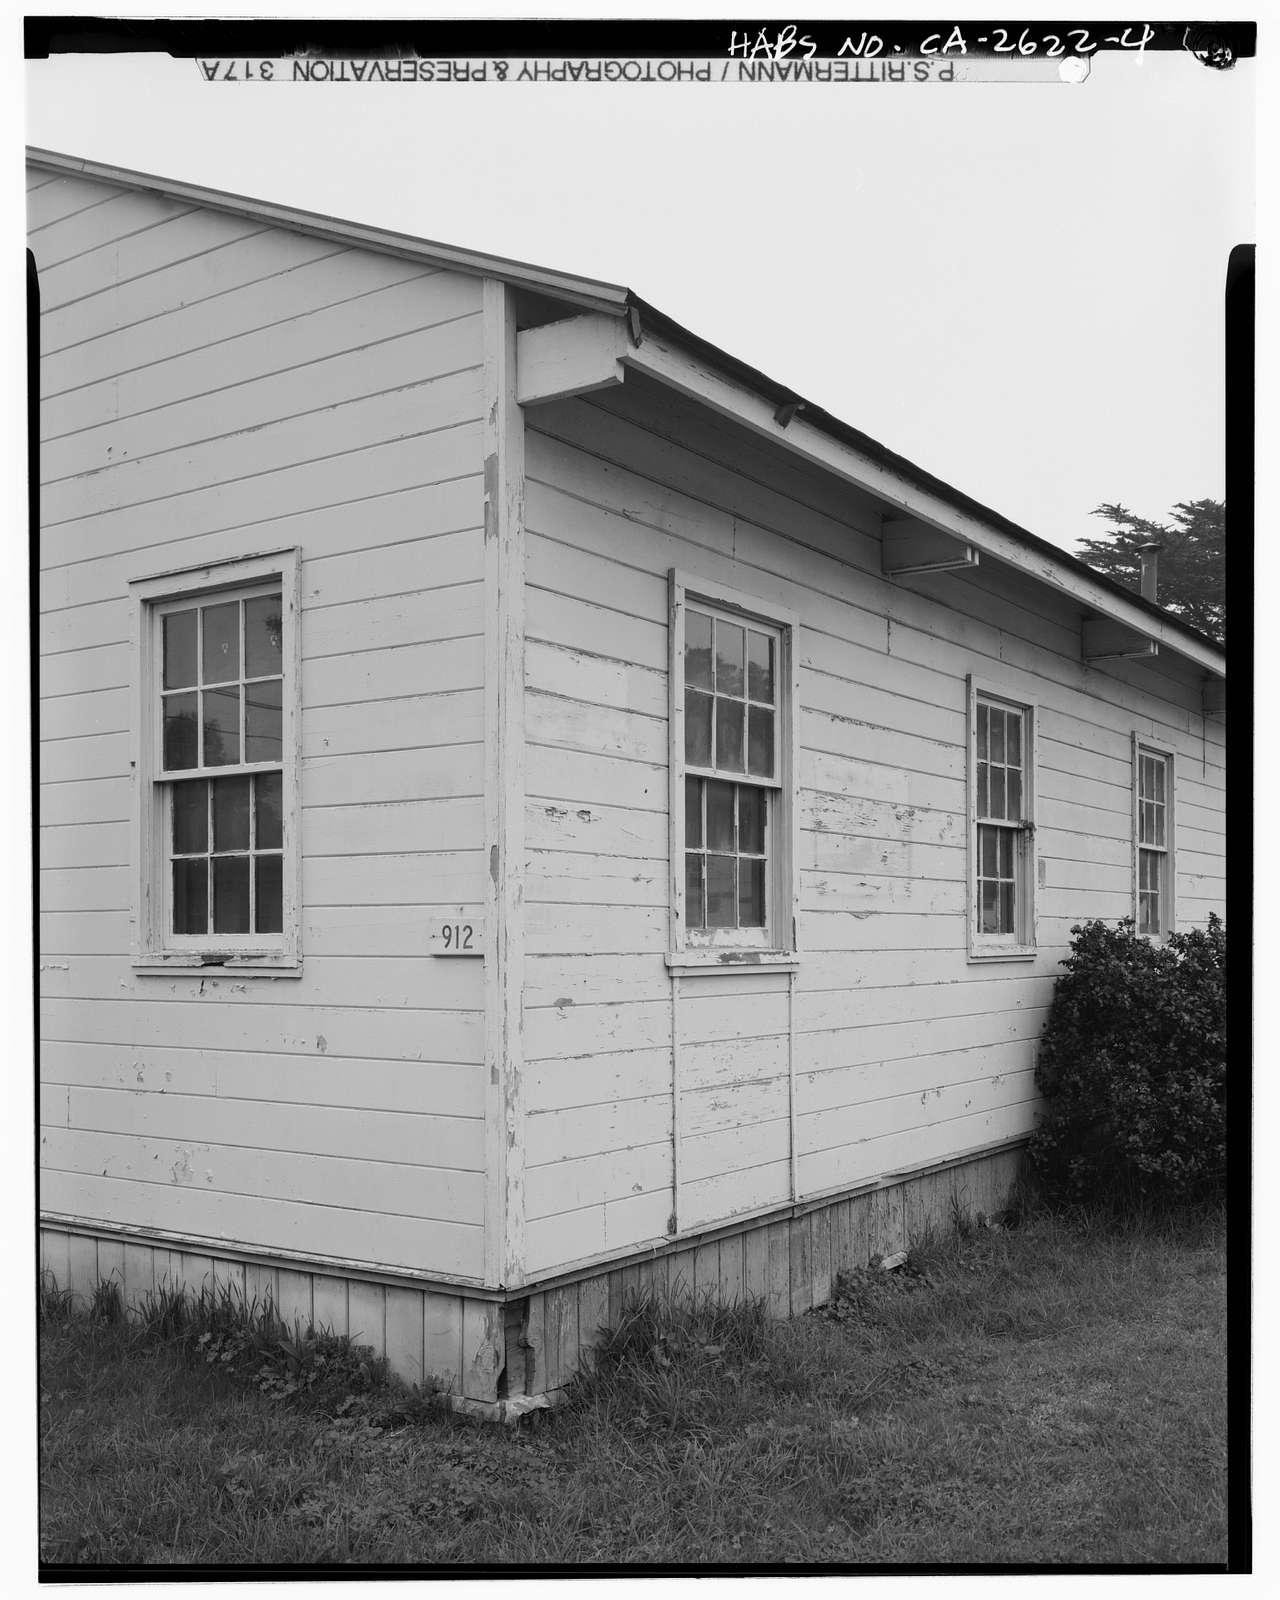 Presidio of San Francisco, Post Exchange, West end of Crissy Field, McDonald Street, San Francisco, San Francisco County, CA